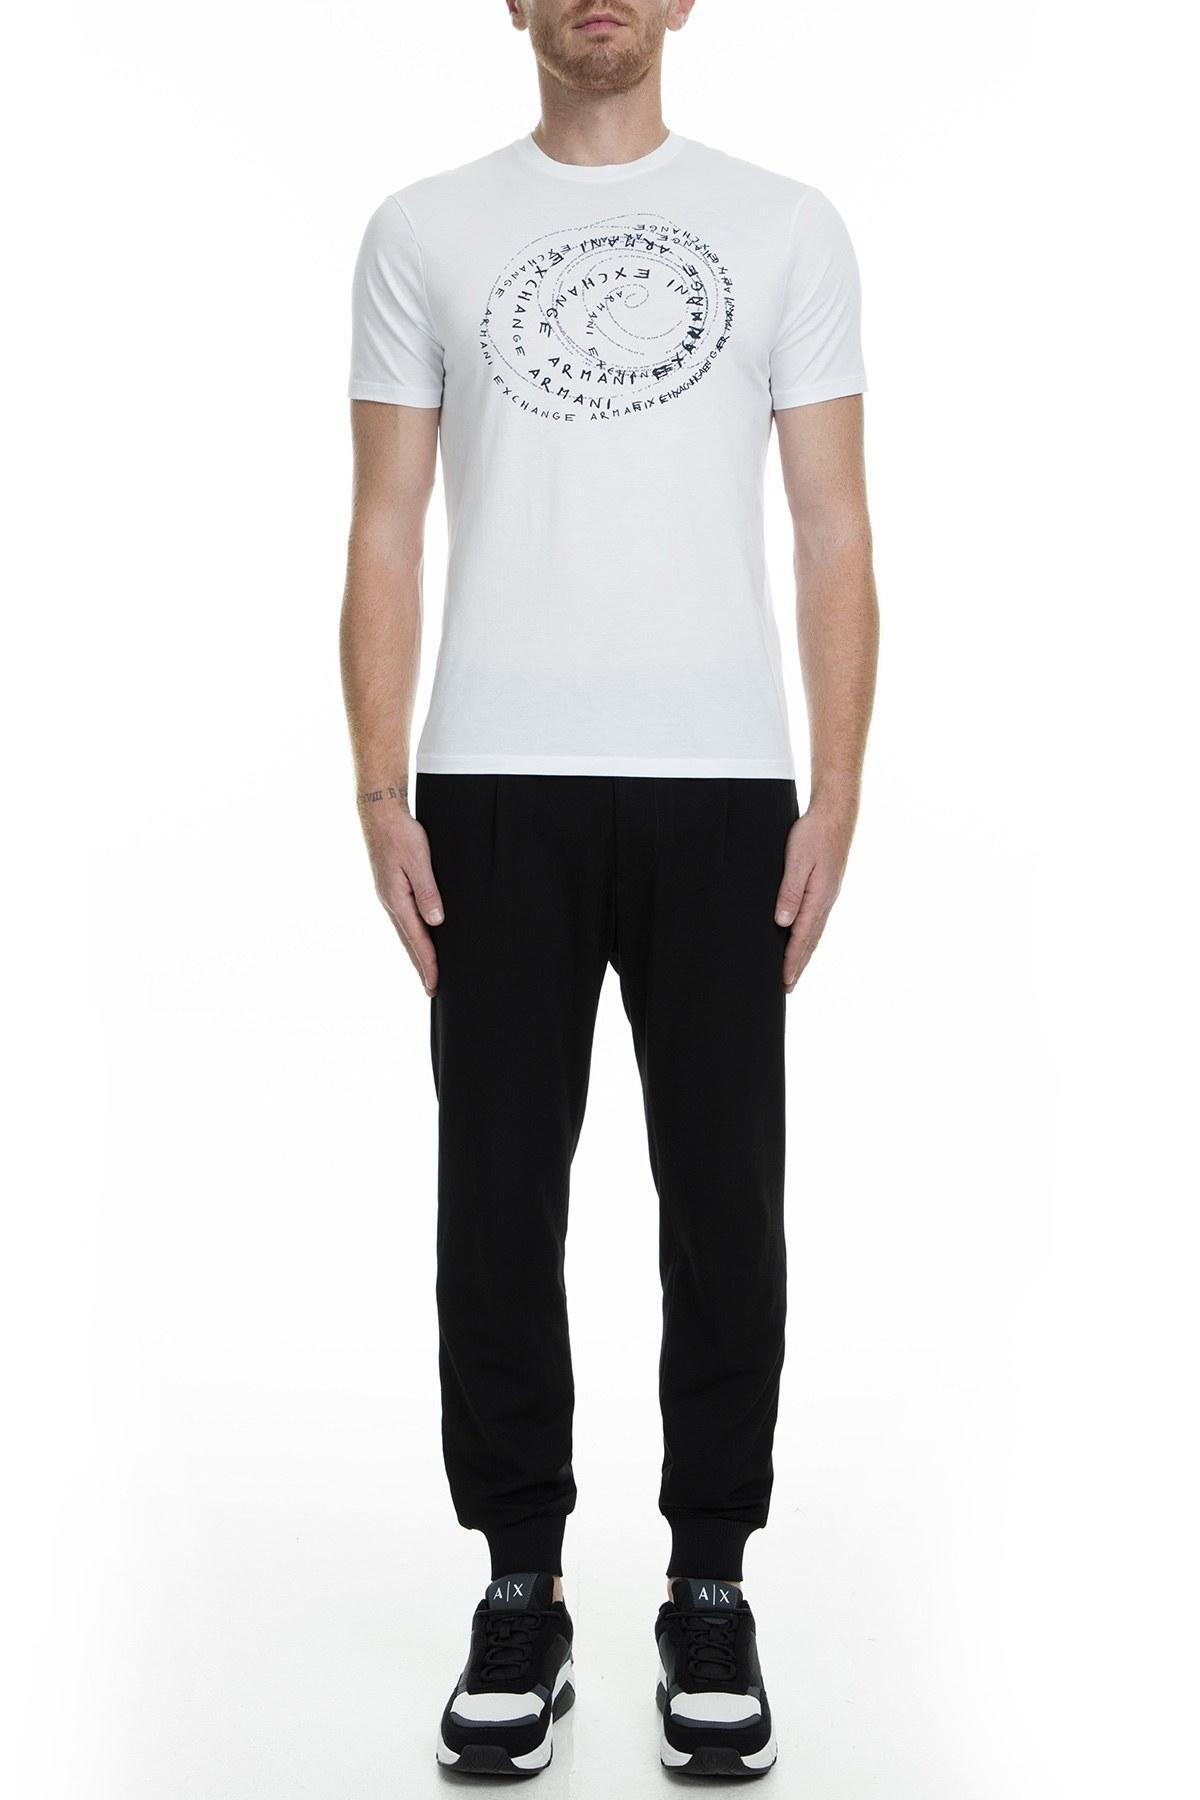 Armani Exchange Erkek T Shirt 6GZTDX ZJA5Z 1100 BEYAZ